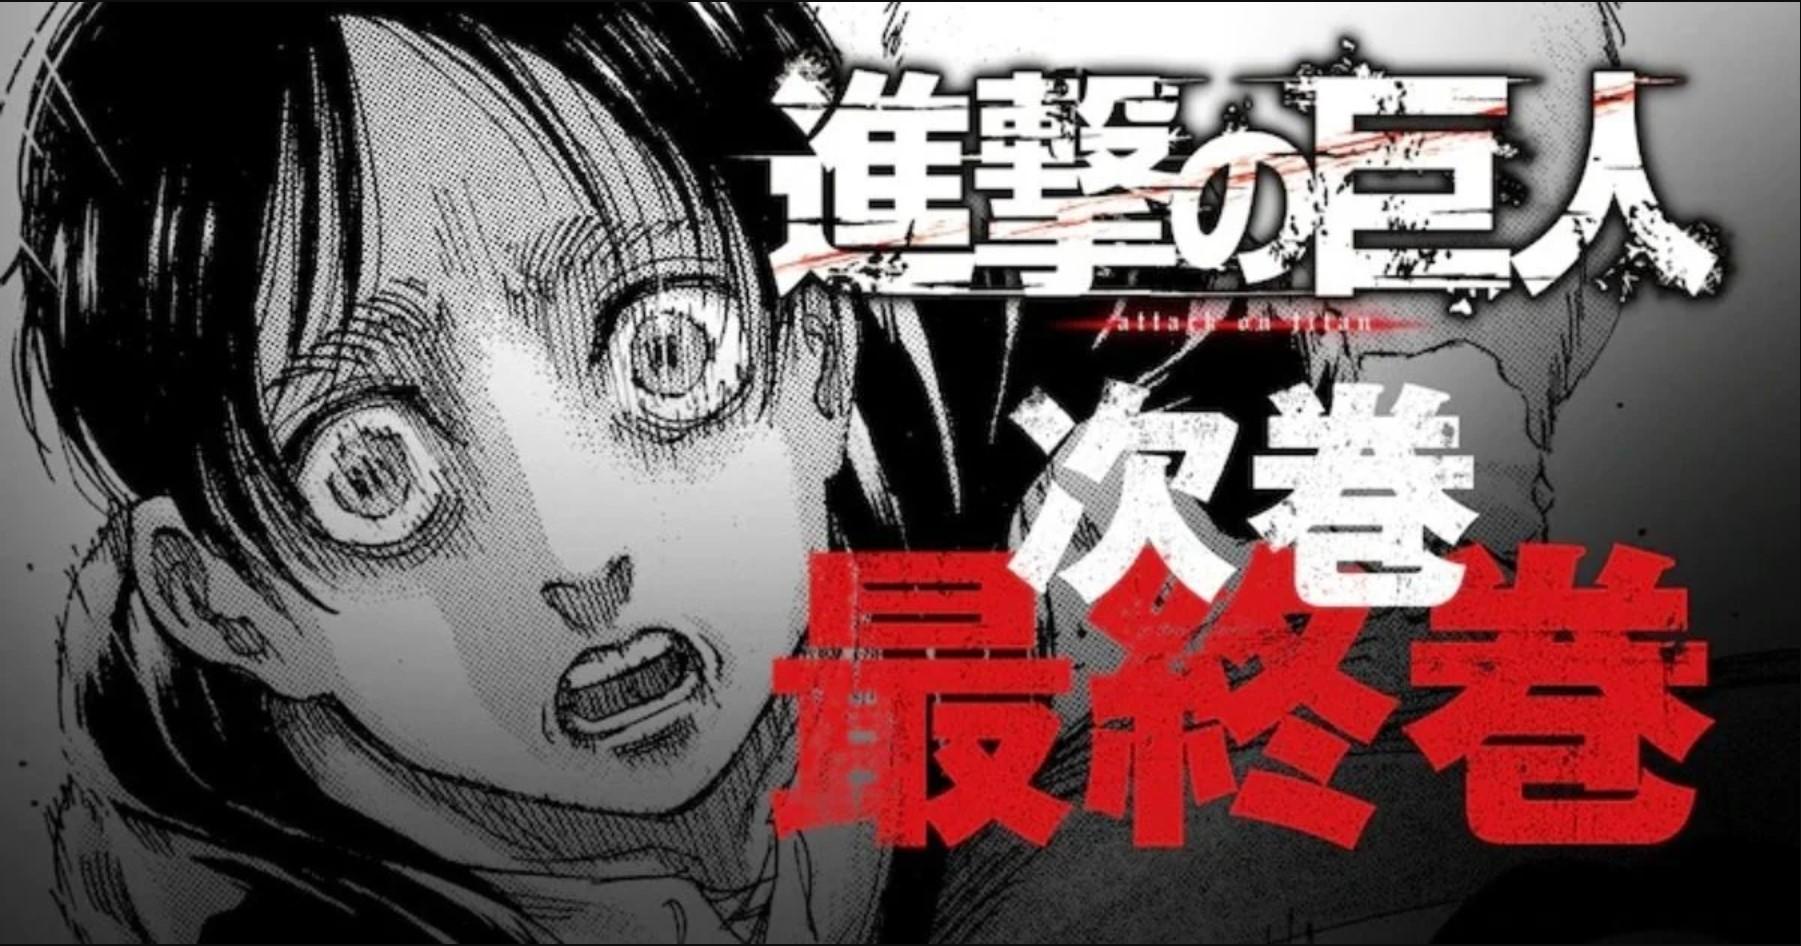 Attack on Titan manga